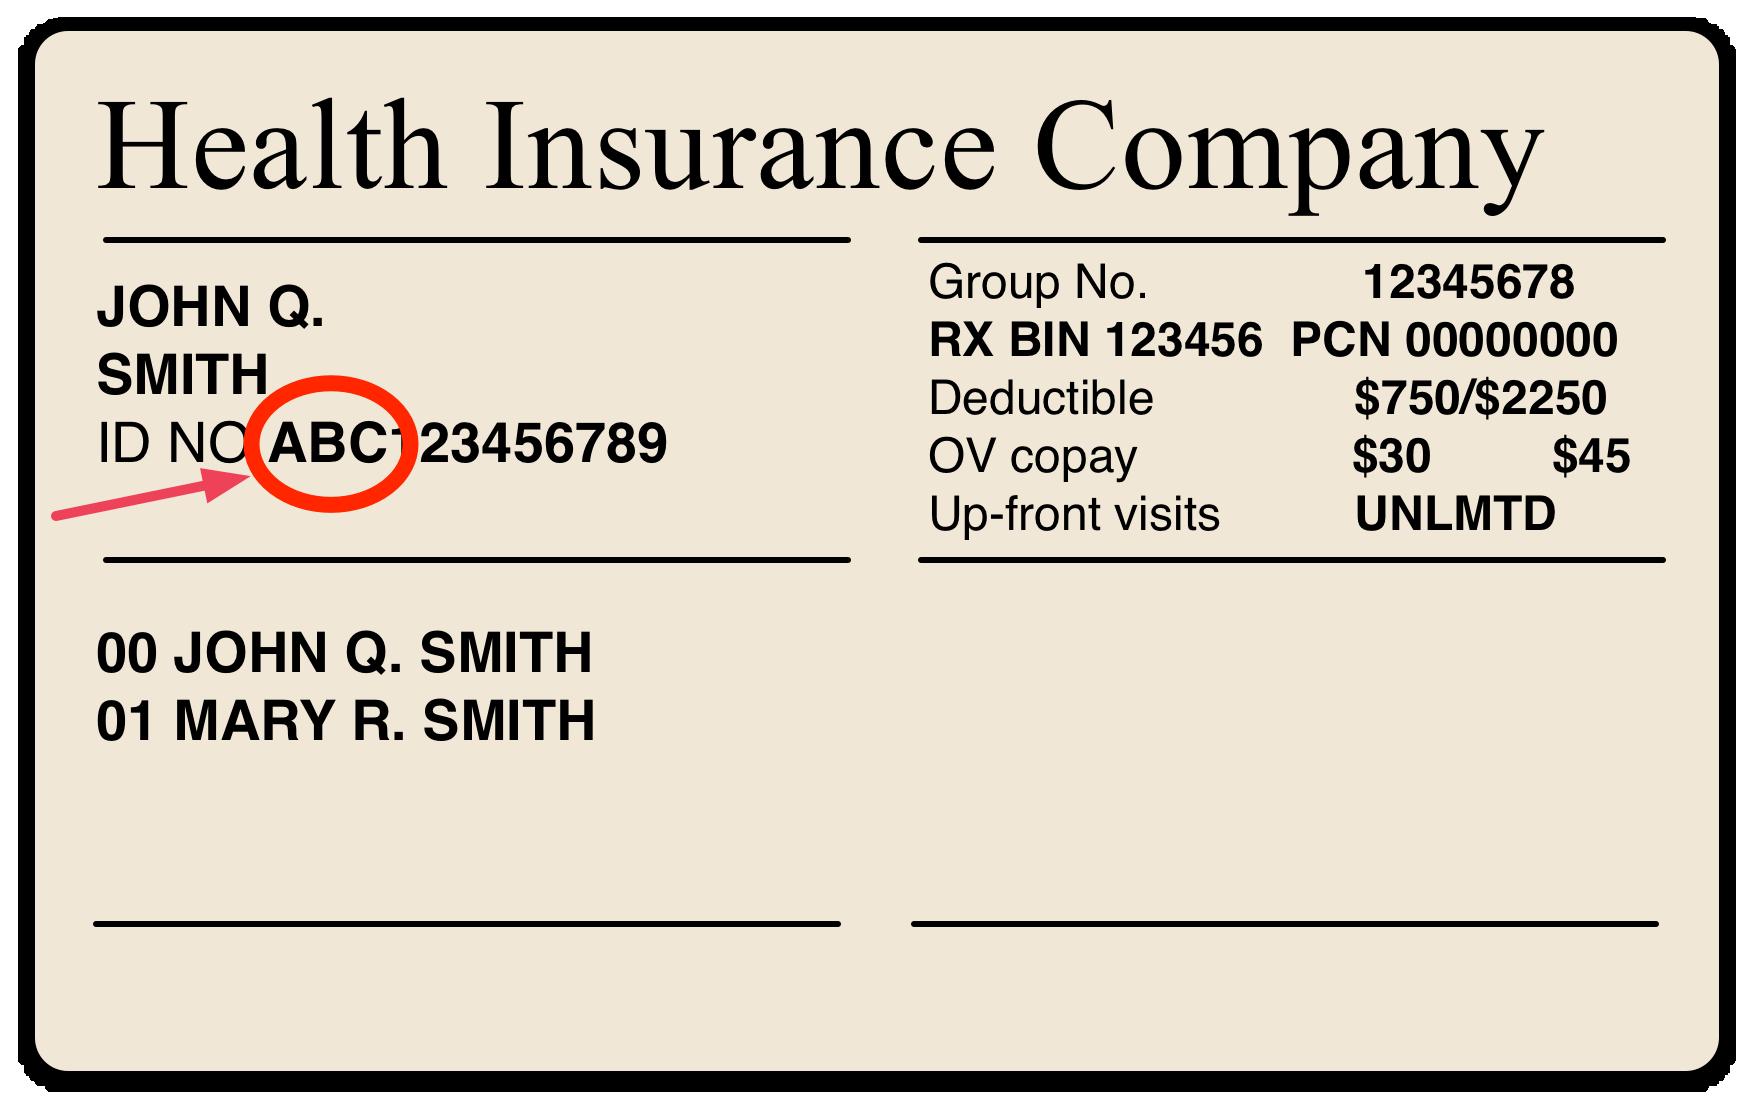 Velugubanti Gireesh Southfield Mi Blue Cross In Network Highly Recommended Health Insurance Companies John Q Health Insurance